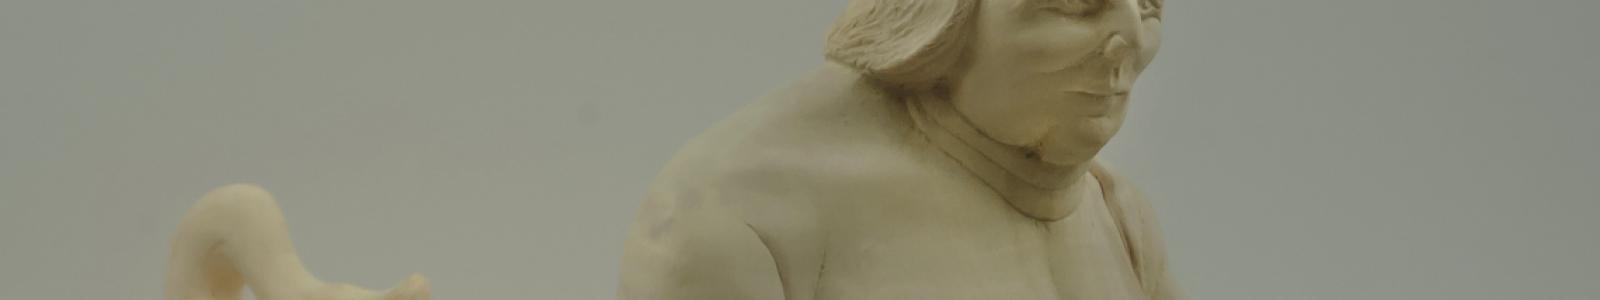 Gallery Sculptor Alexey Bykov